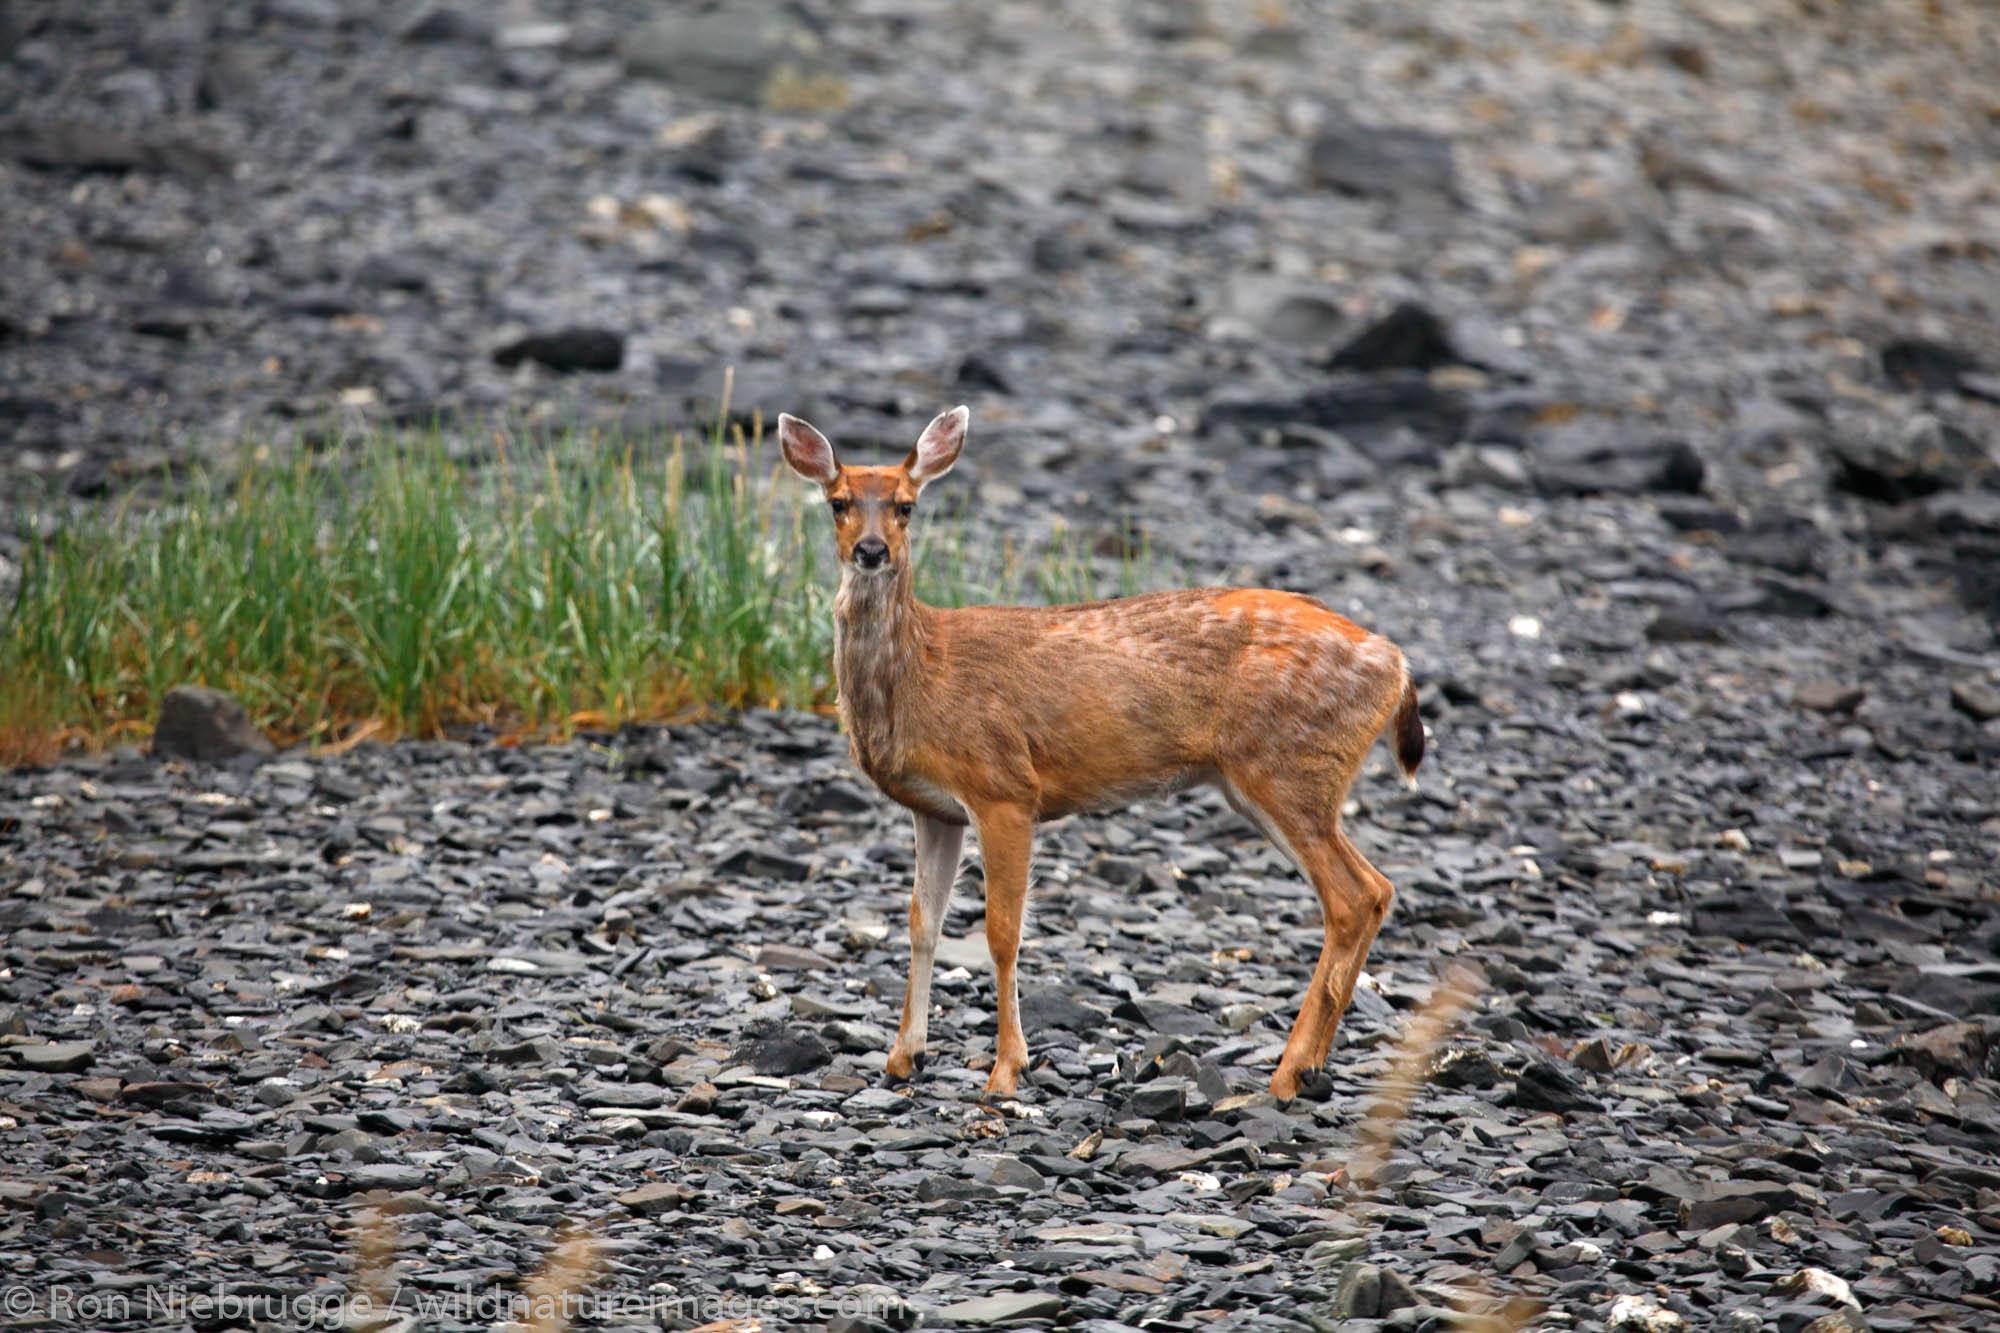 Sitka Black-tailed Deer, (Odocoileus hemionus sitkensis), Barry Arm, Prince William Sound, Chugach National Forest, Alaska.